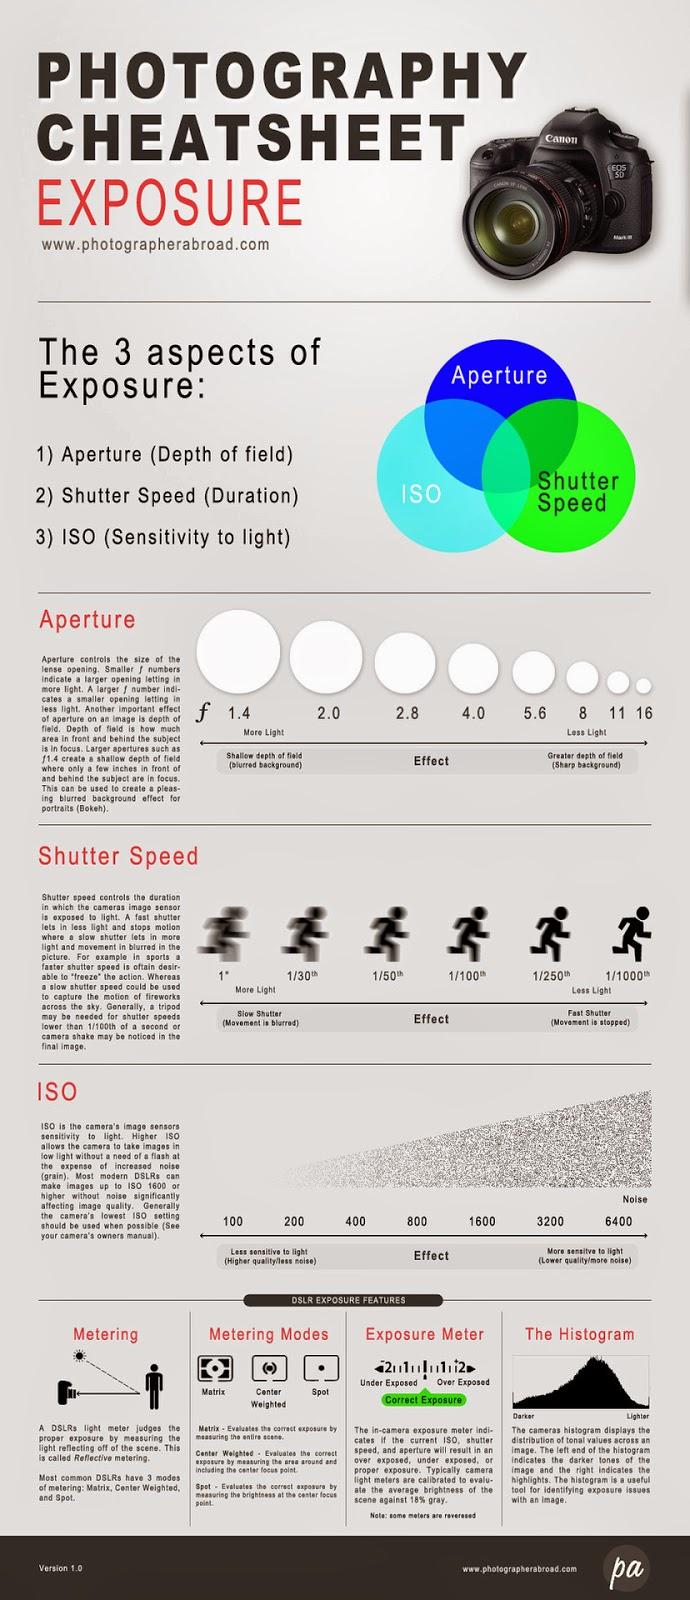 Better Exposure in 3 Infographics or Less: Photography Cheatsheat Exposure